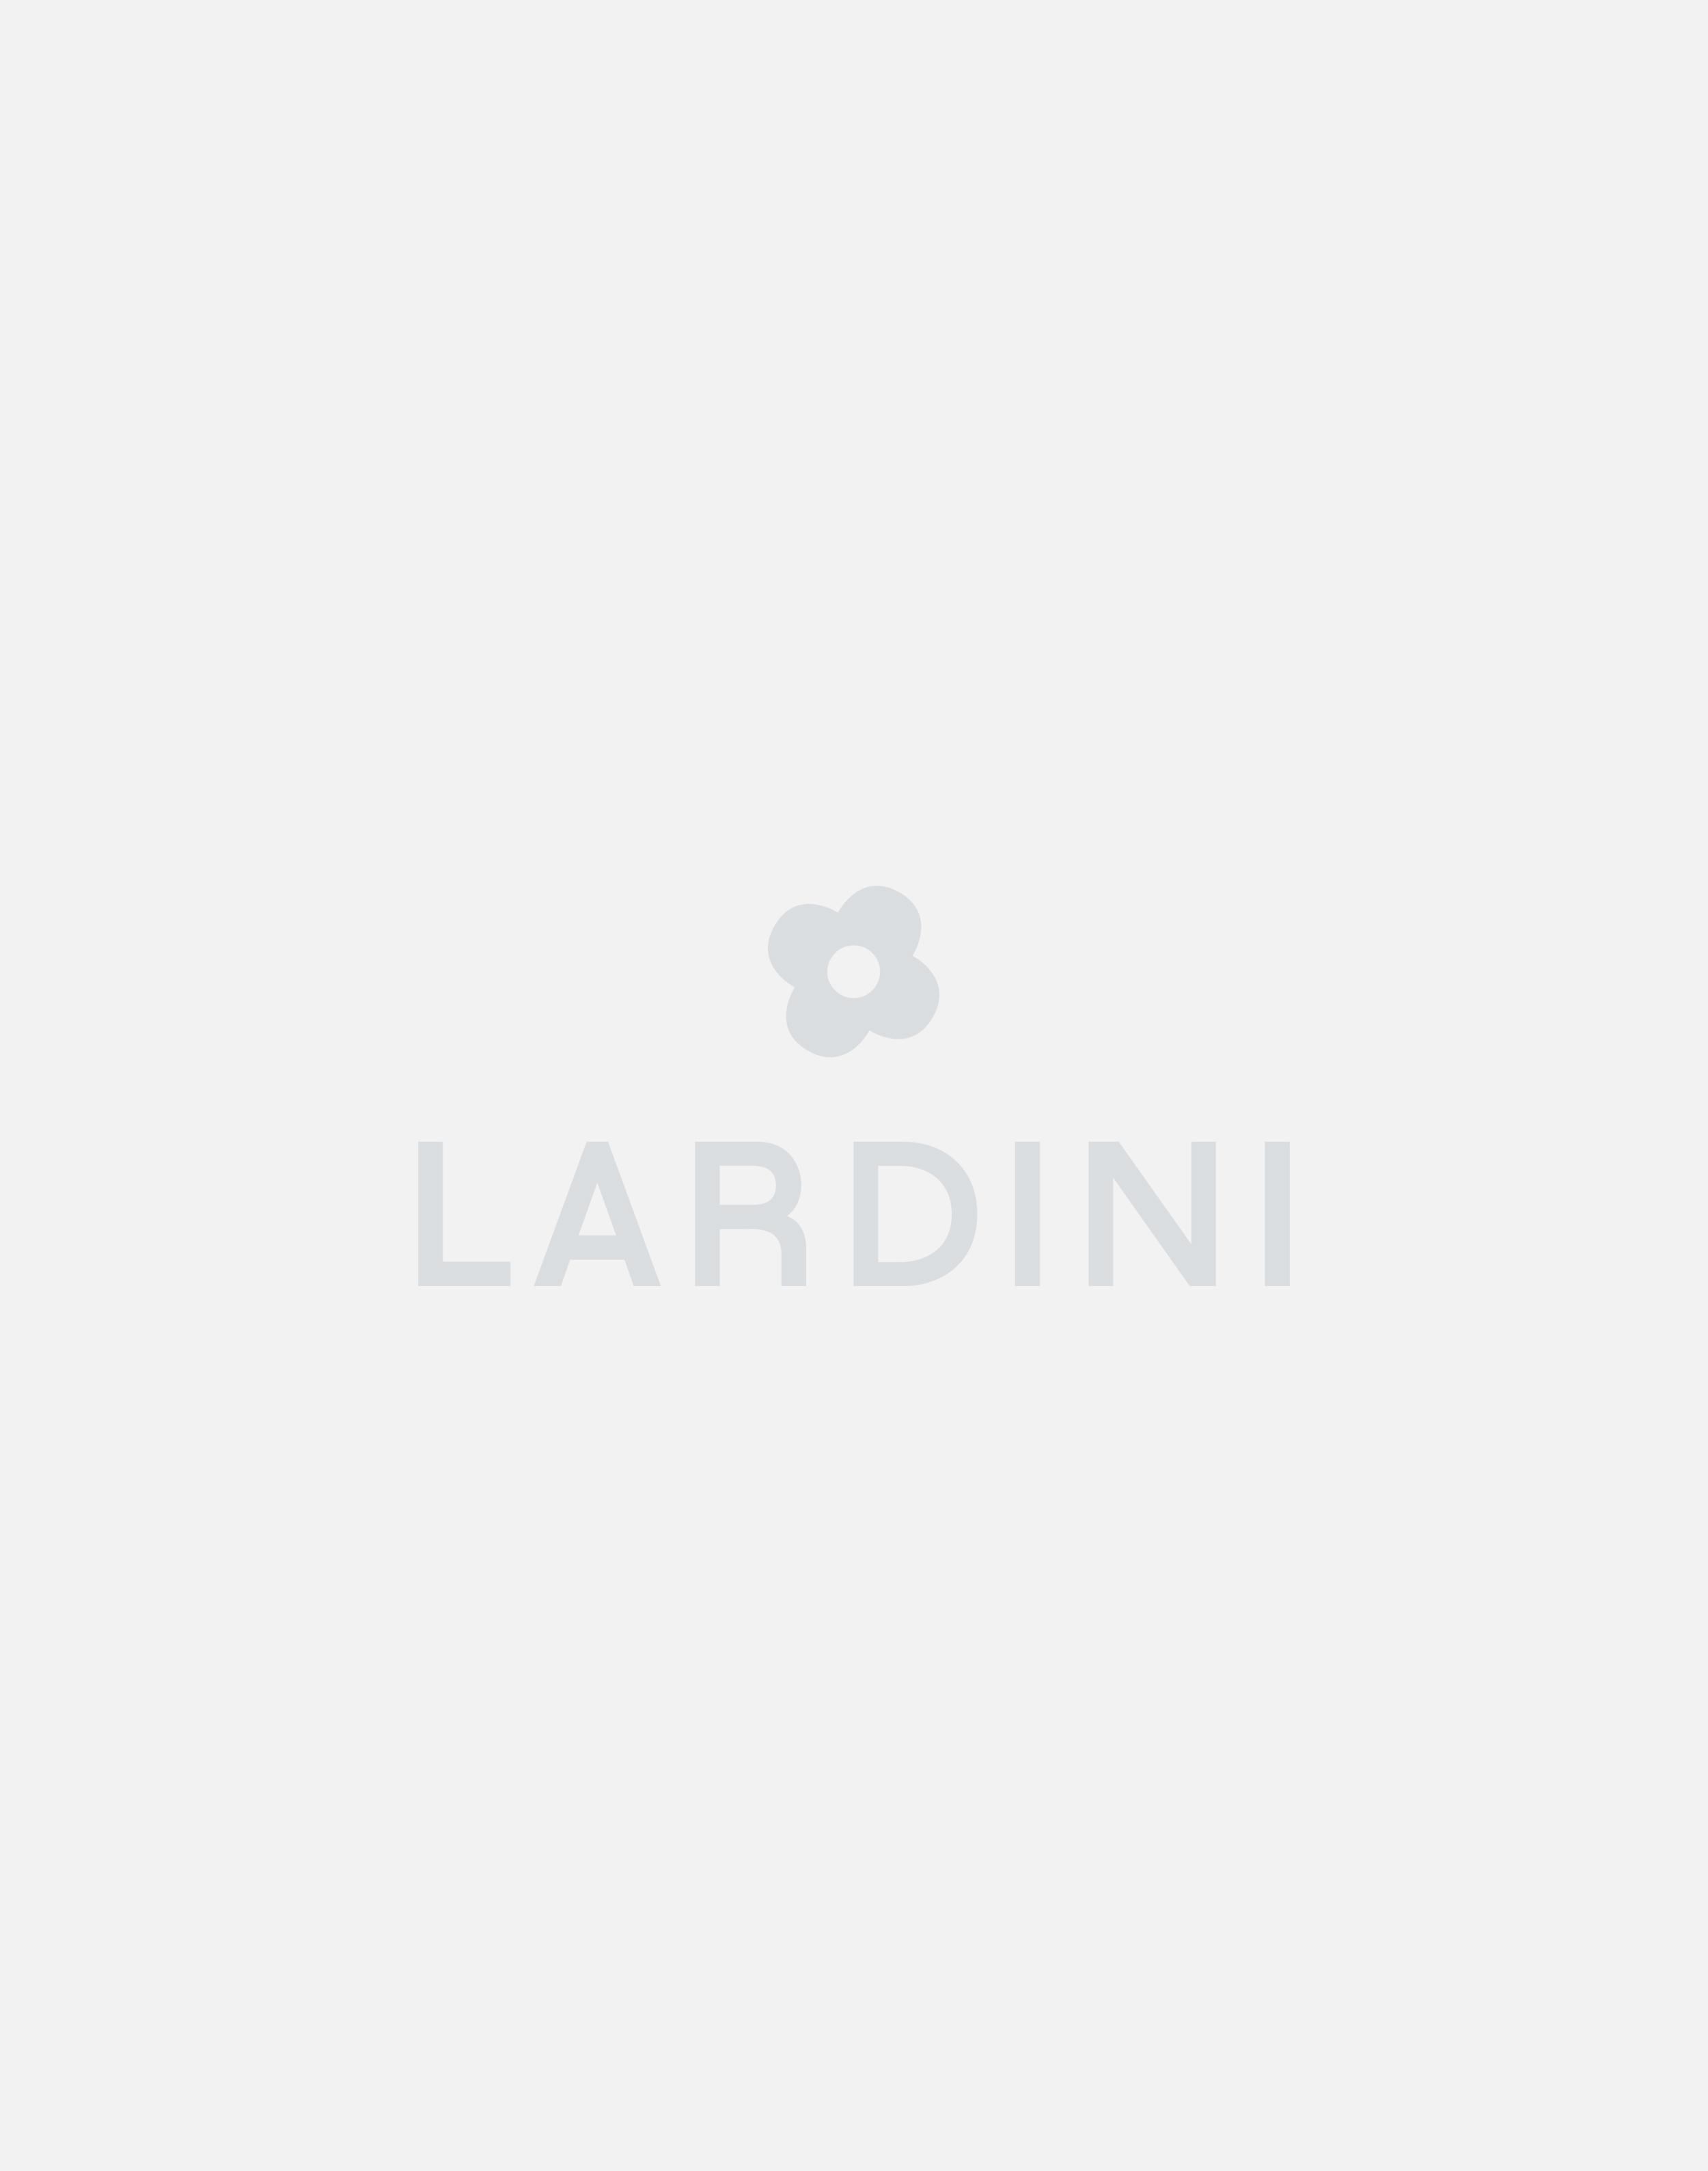 Beige tricot knit pocket square